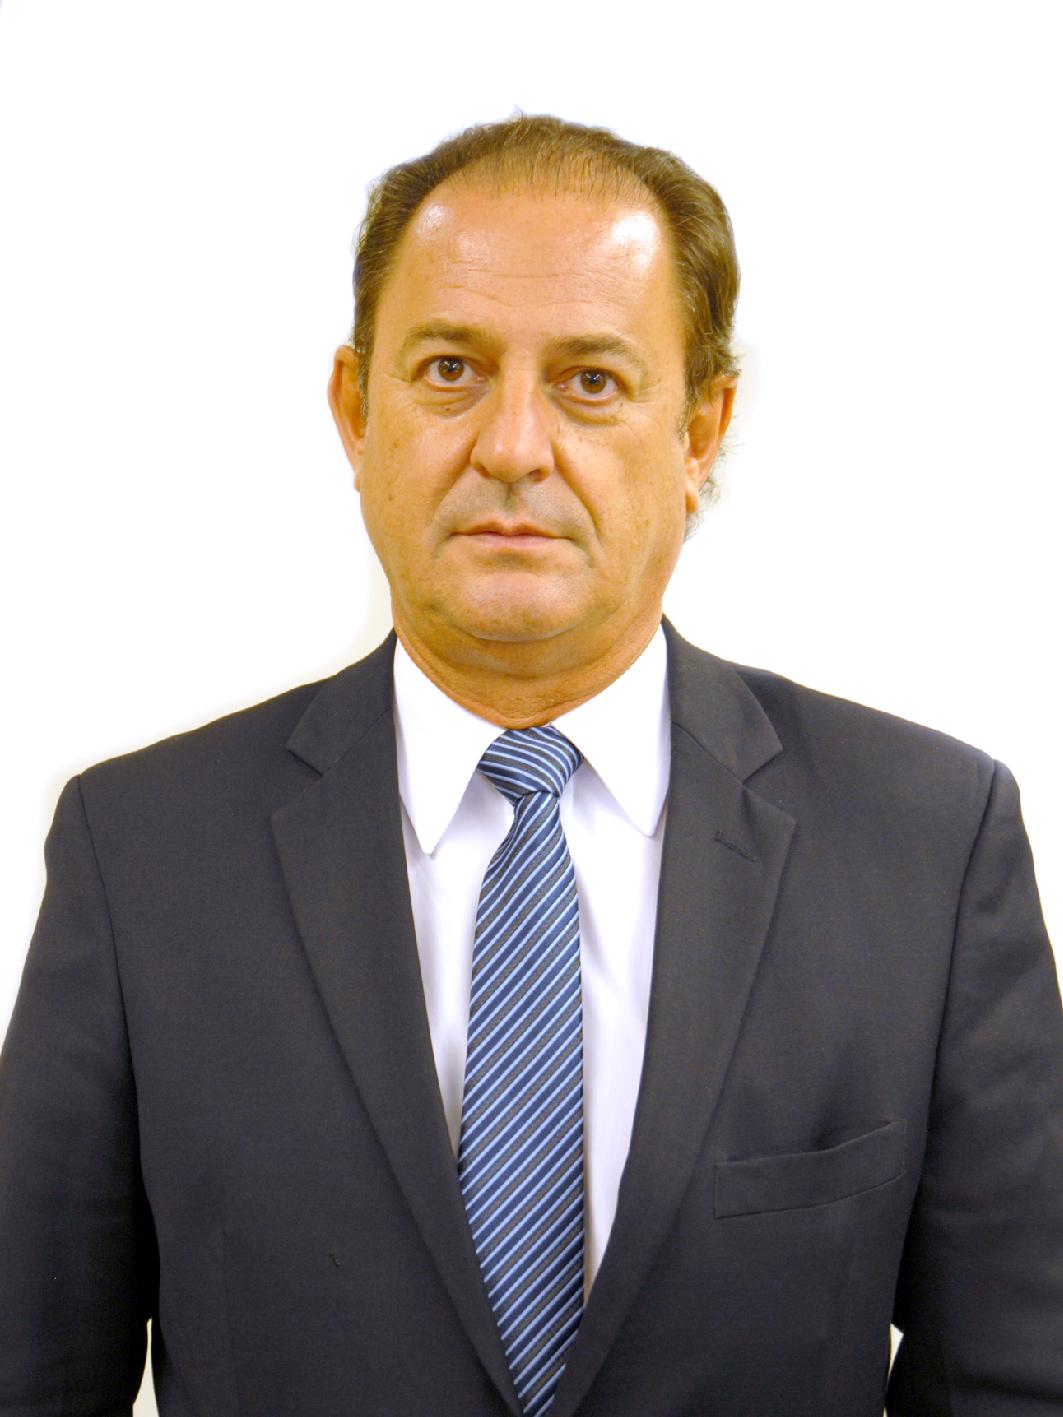 Minister Kátia Magalhães Arruda